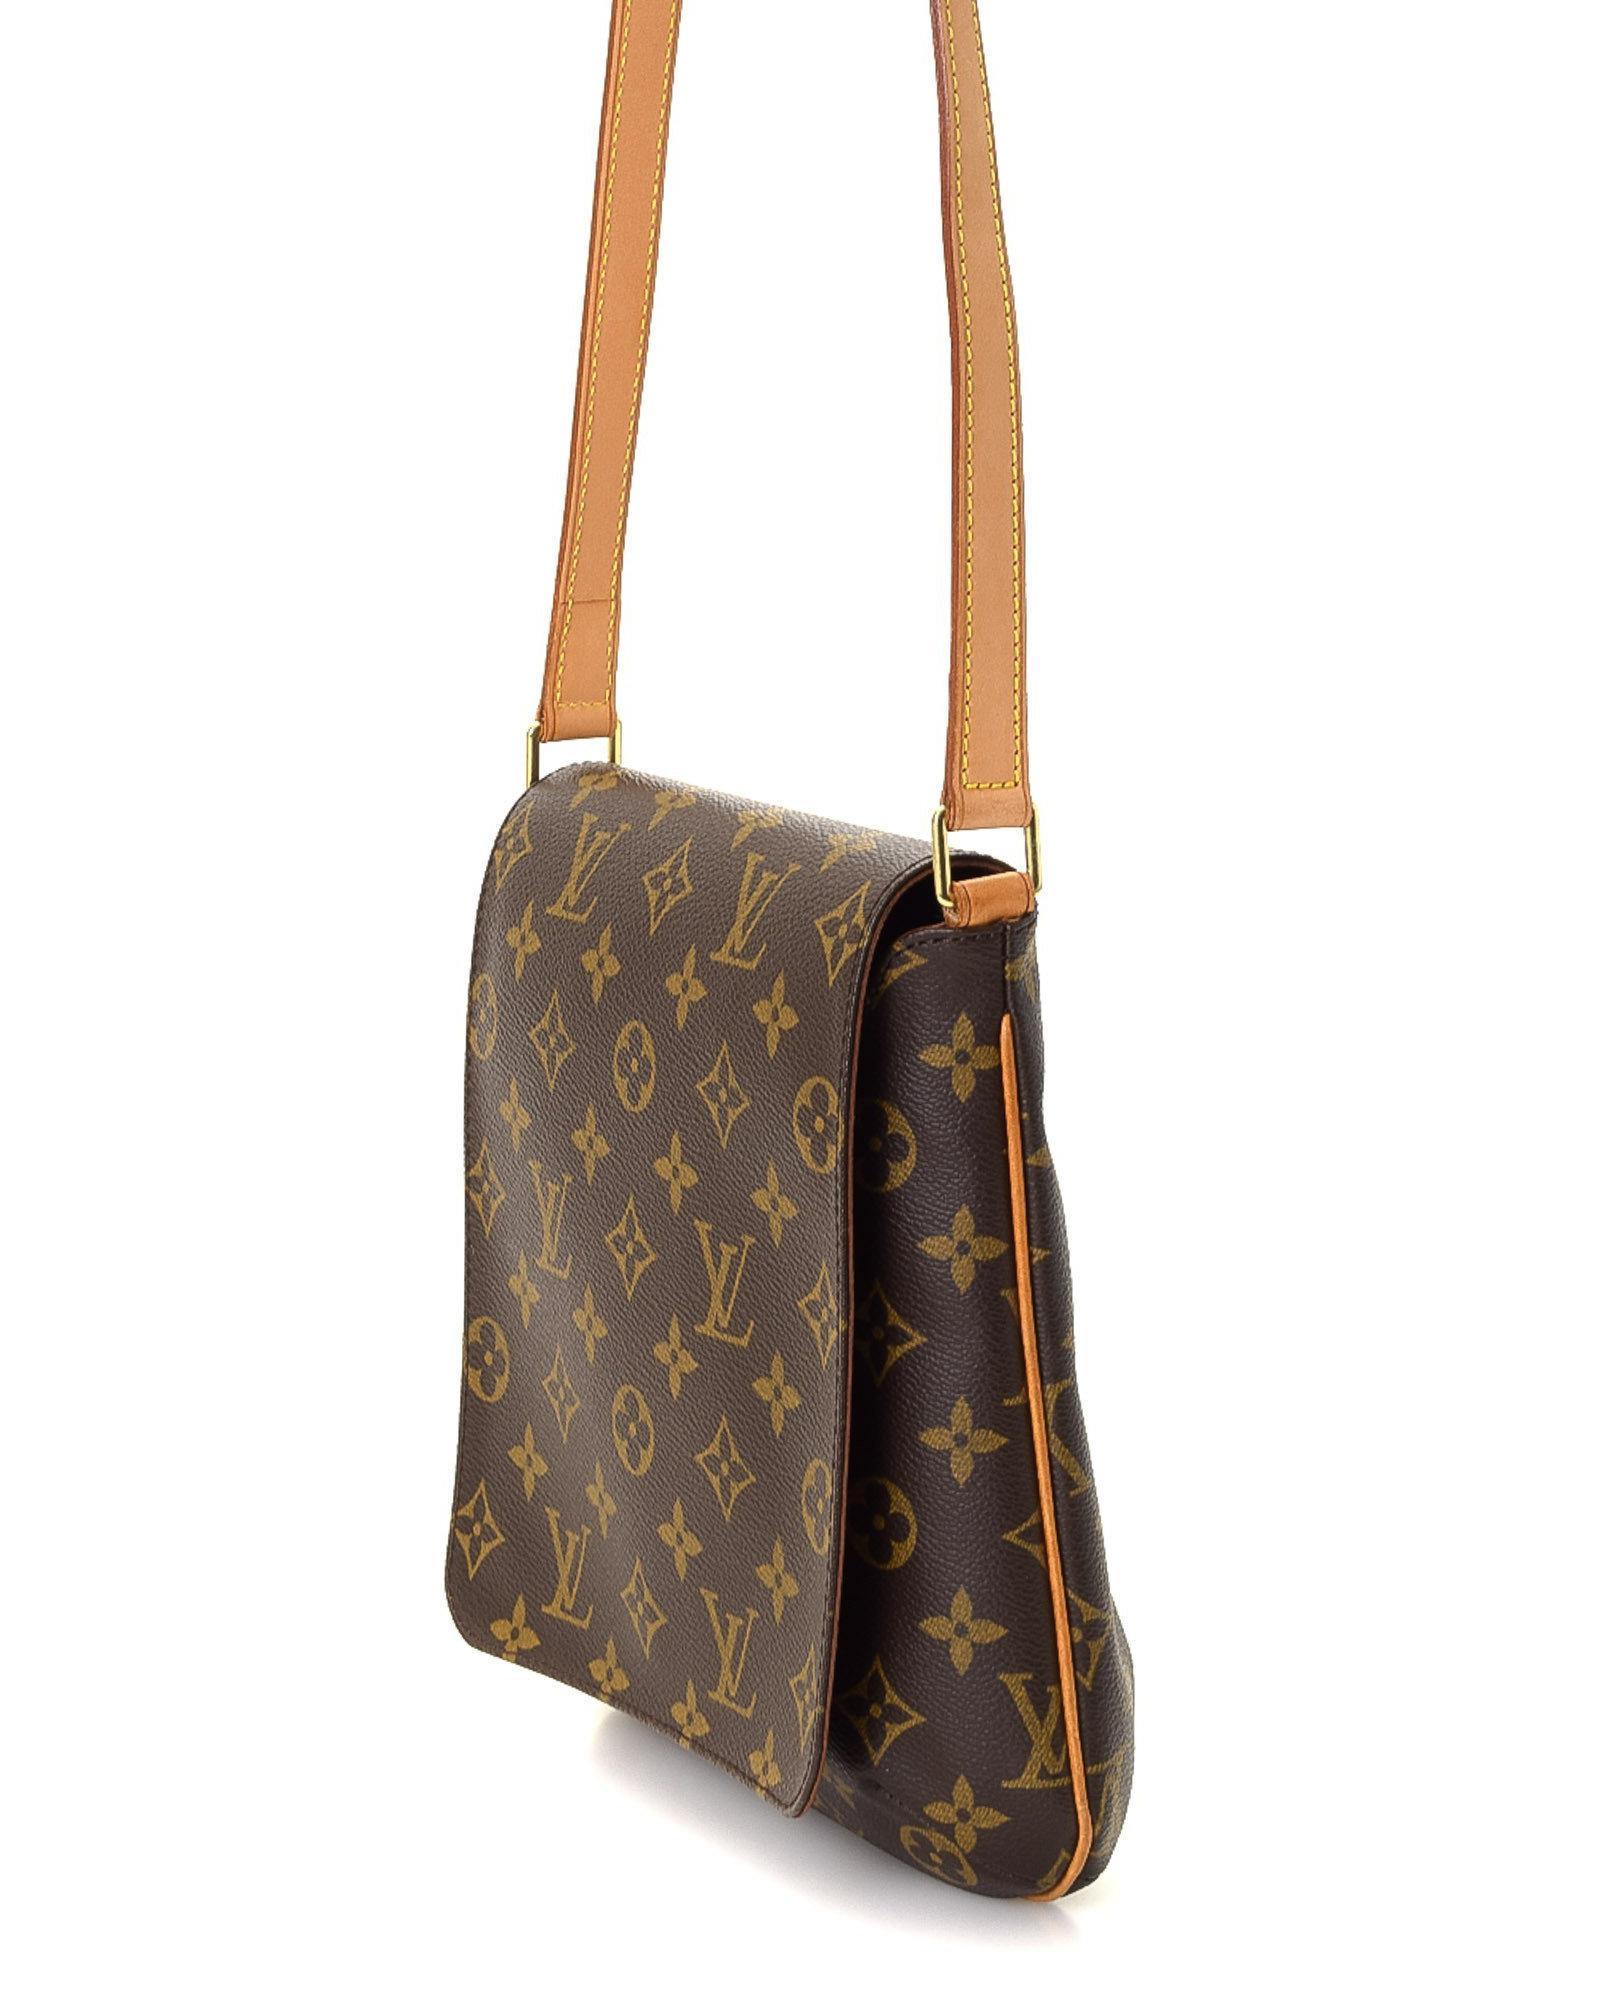 5ac202253f1e Lyst - Louis Vuitton Crossbody Bag - Vintage in Brown